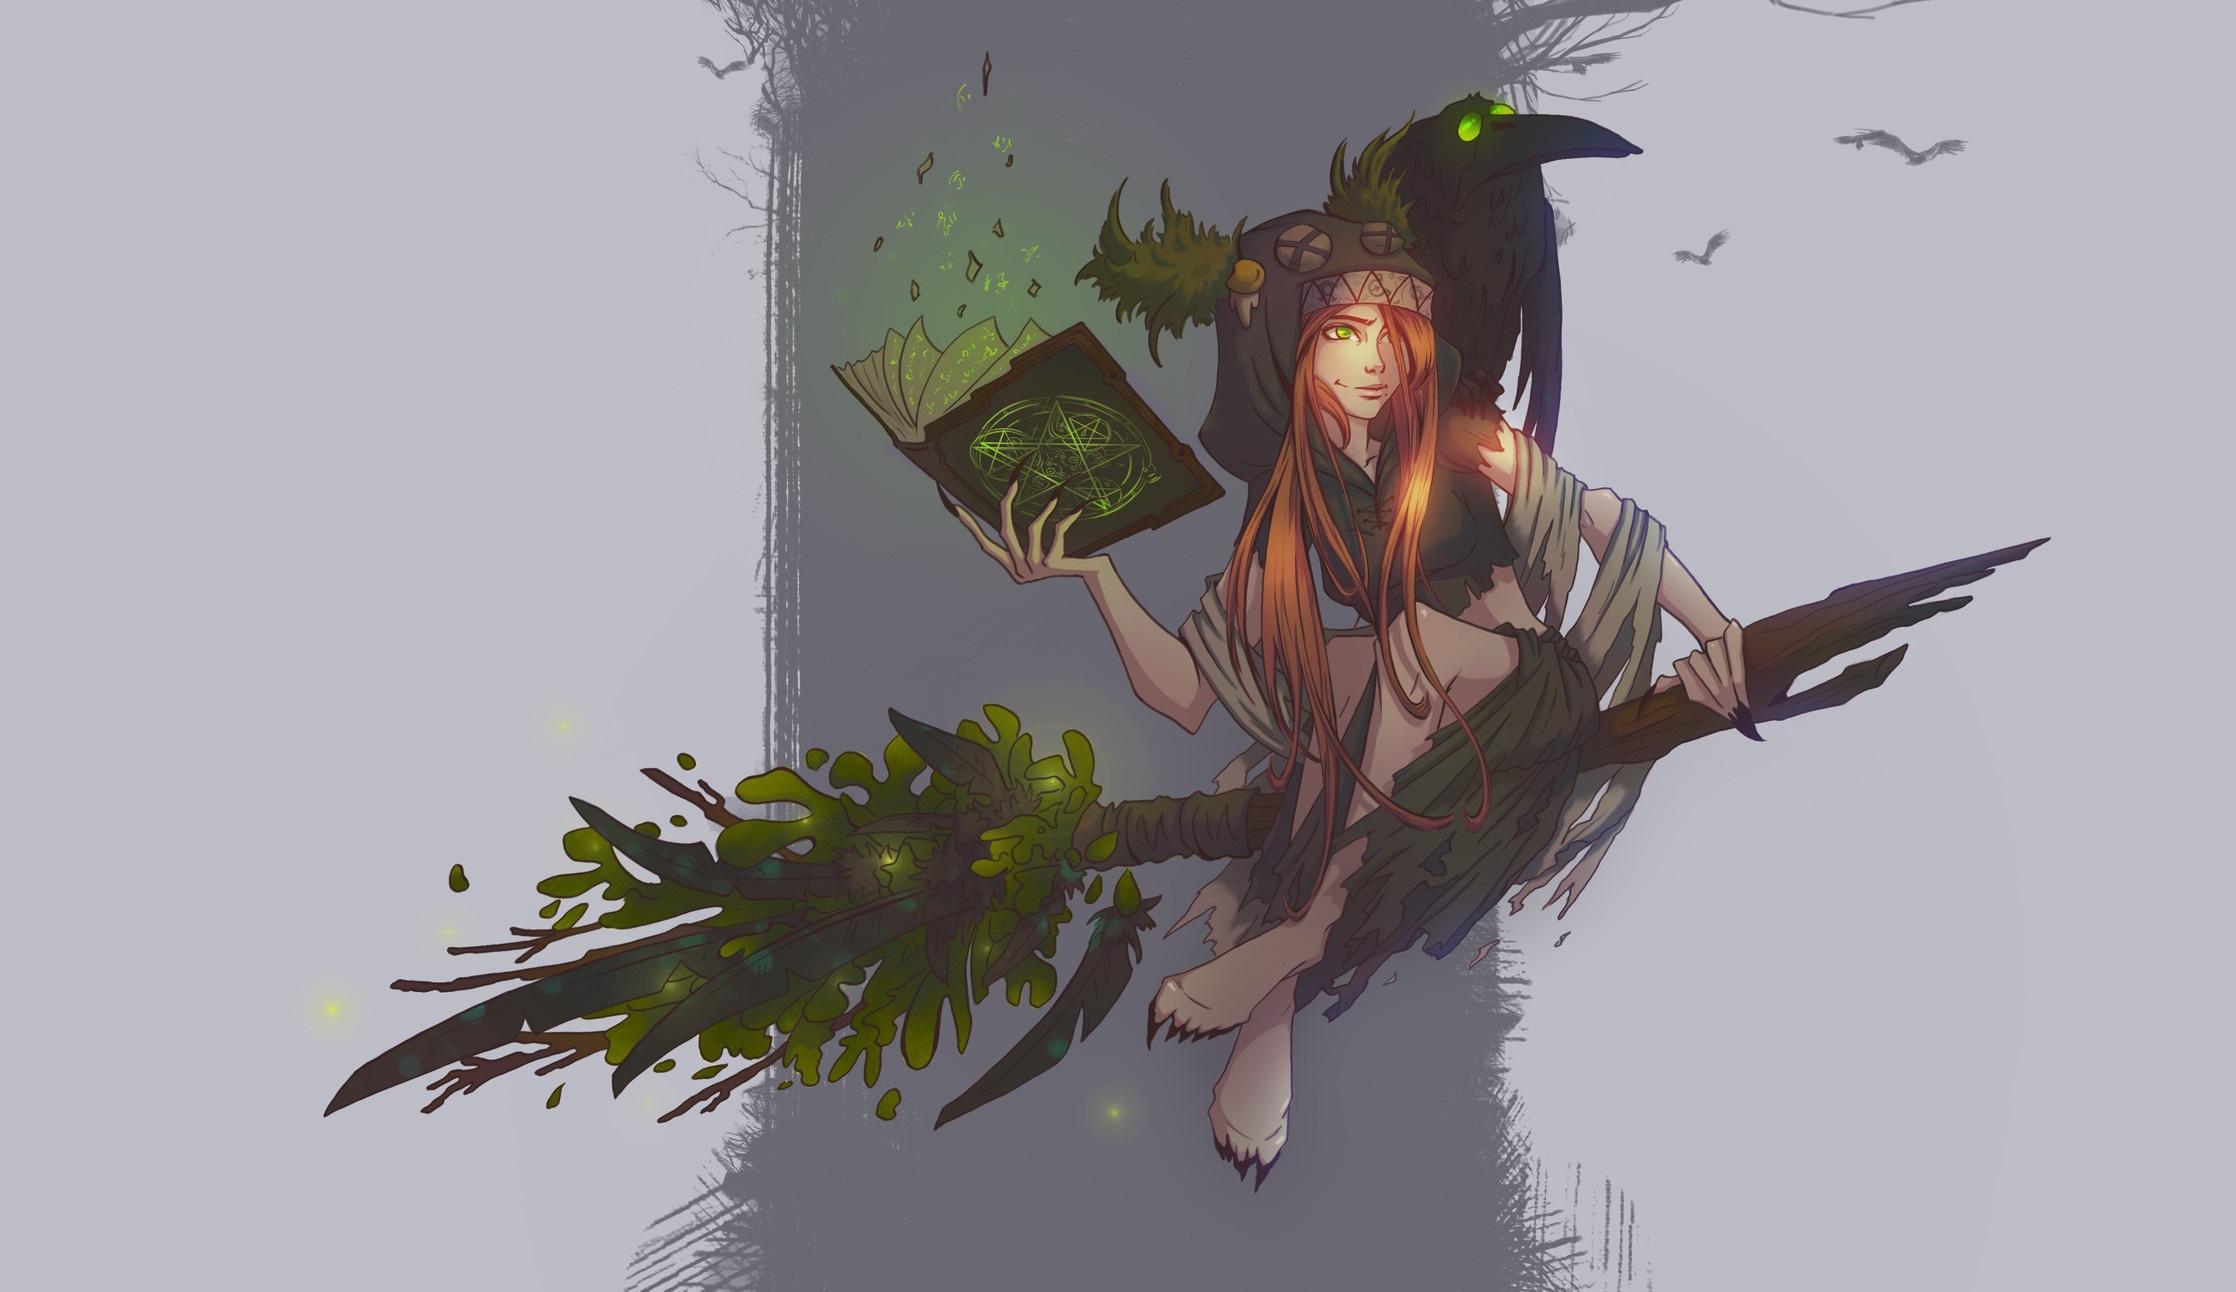 Book Broom Girl Green Eyes Long Hair Orange Hair Raven Witch Woman 2236x1292